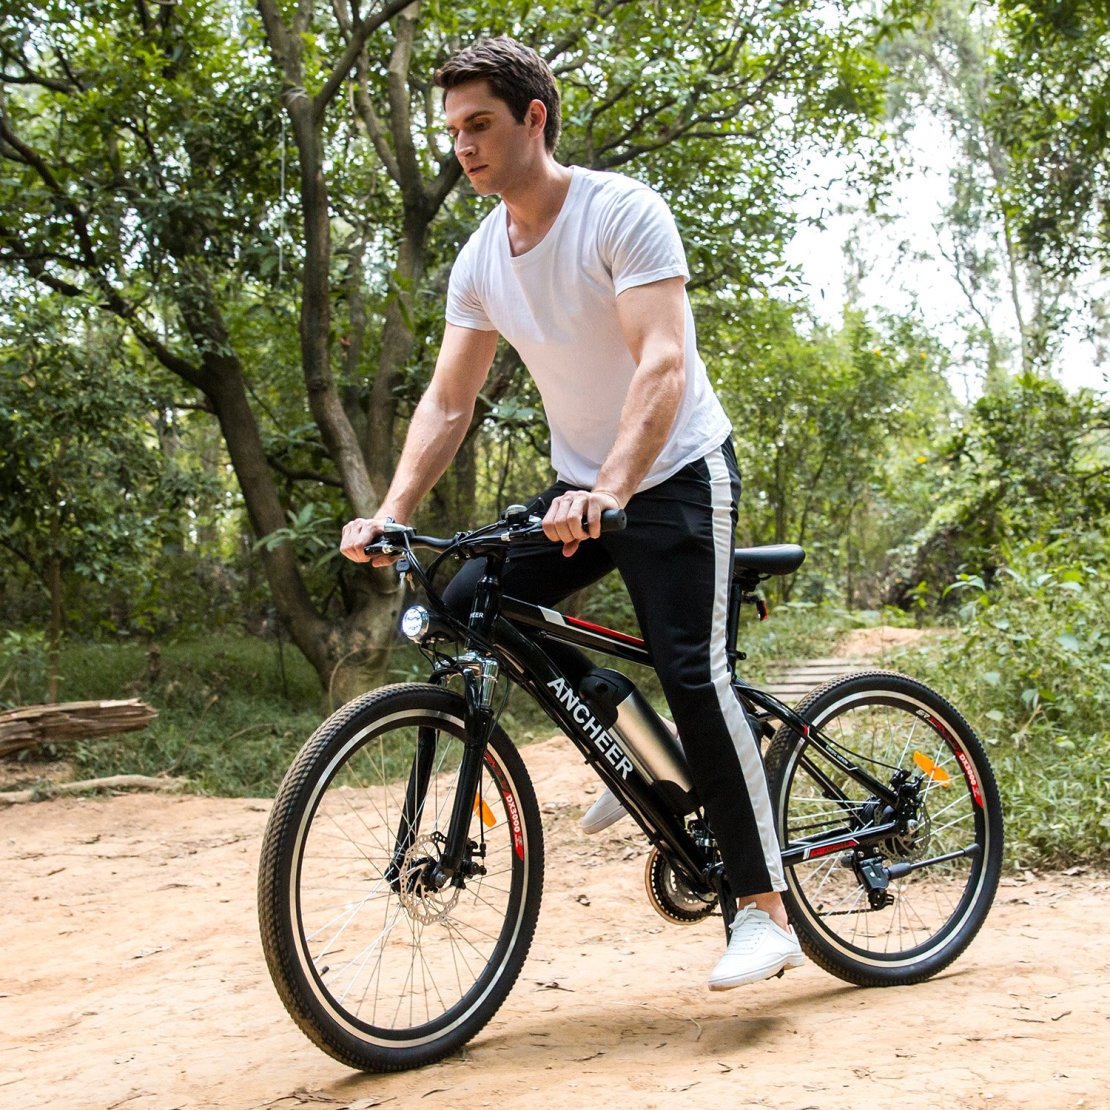 91L7KOULJaL. SL1500  - 10 Best Electric Bikes 2019